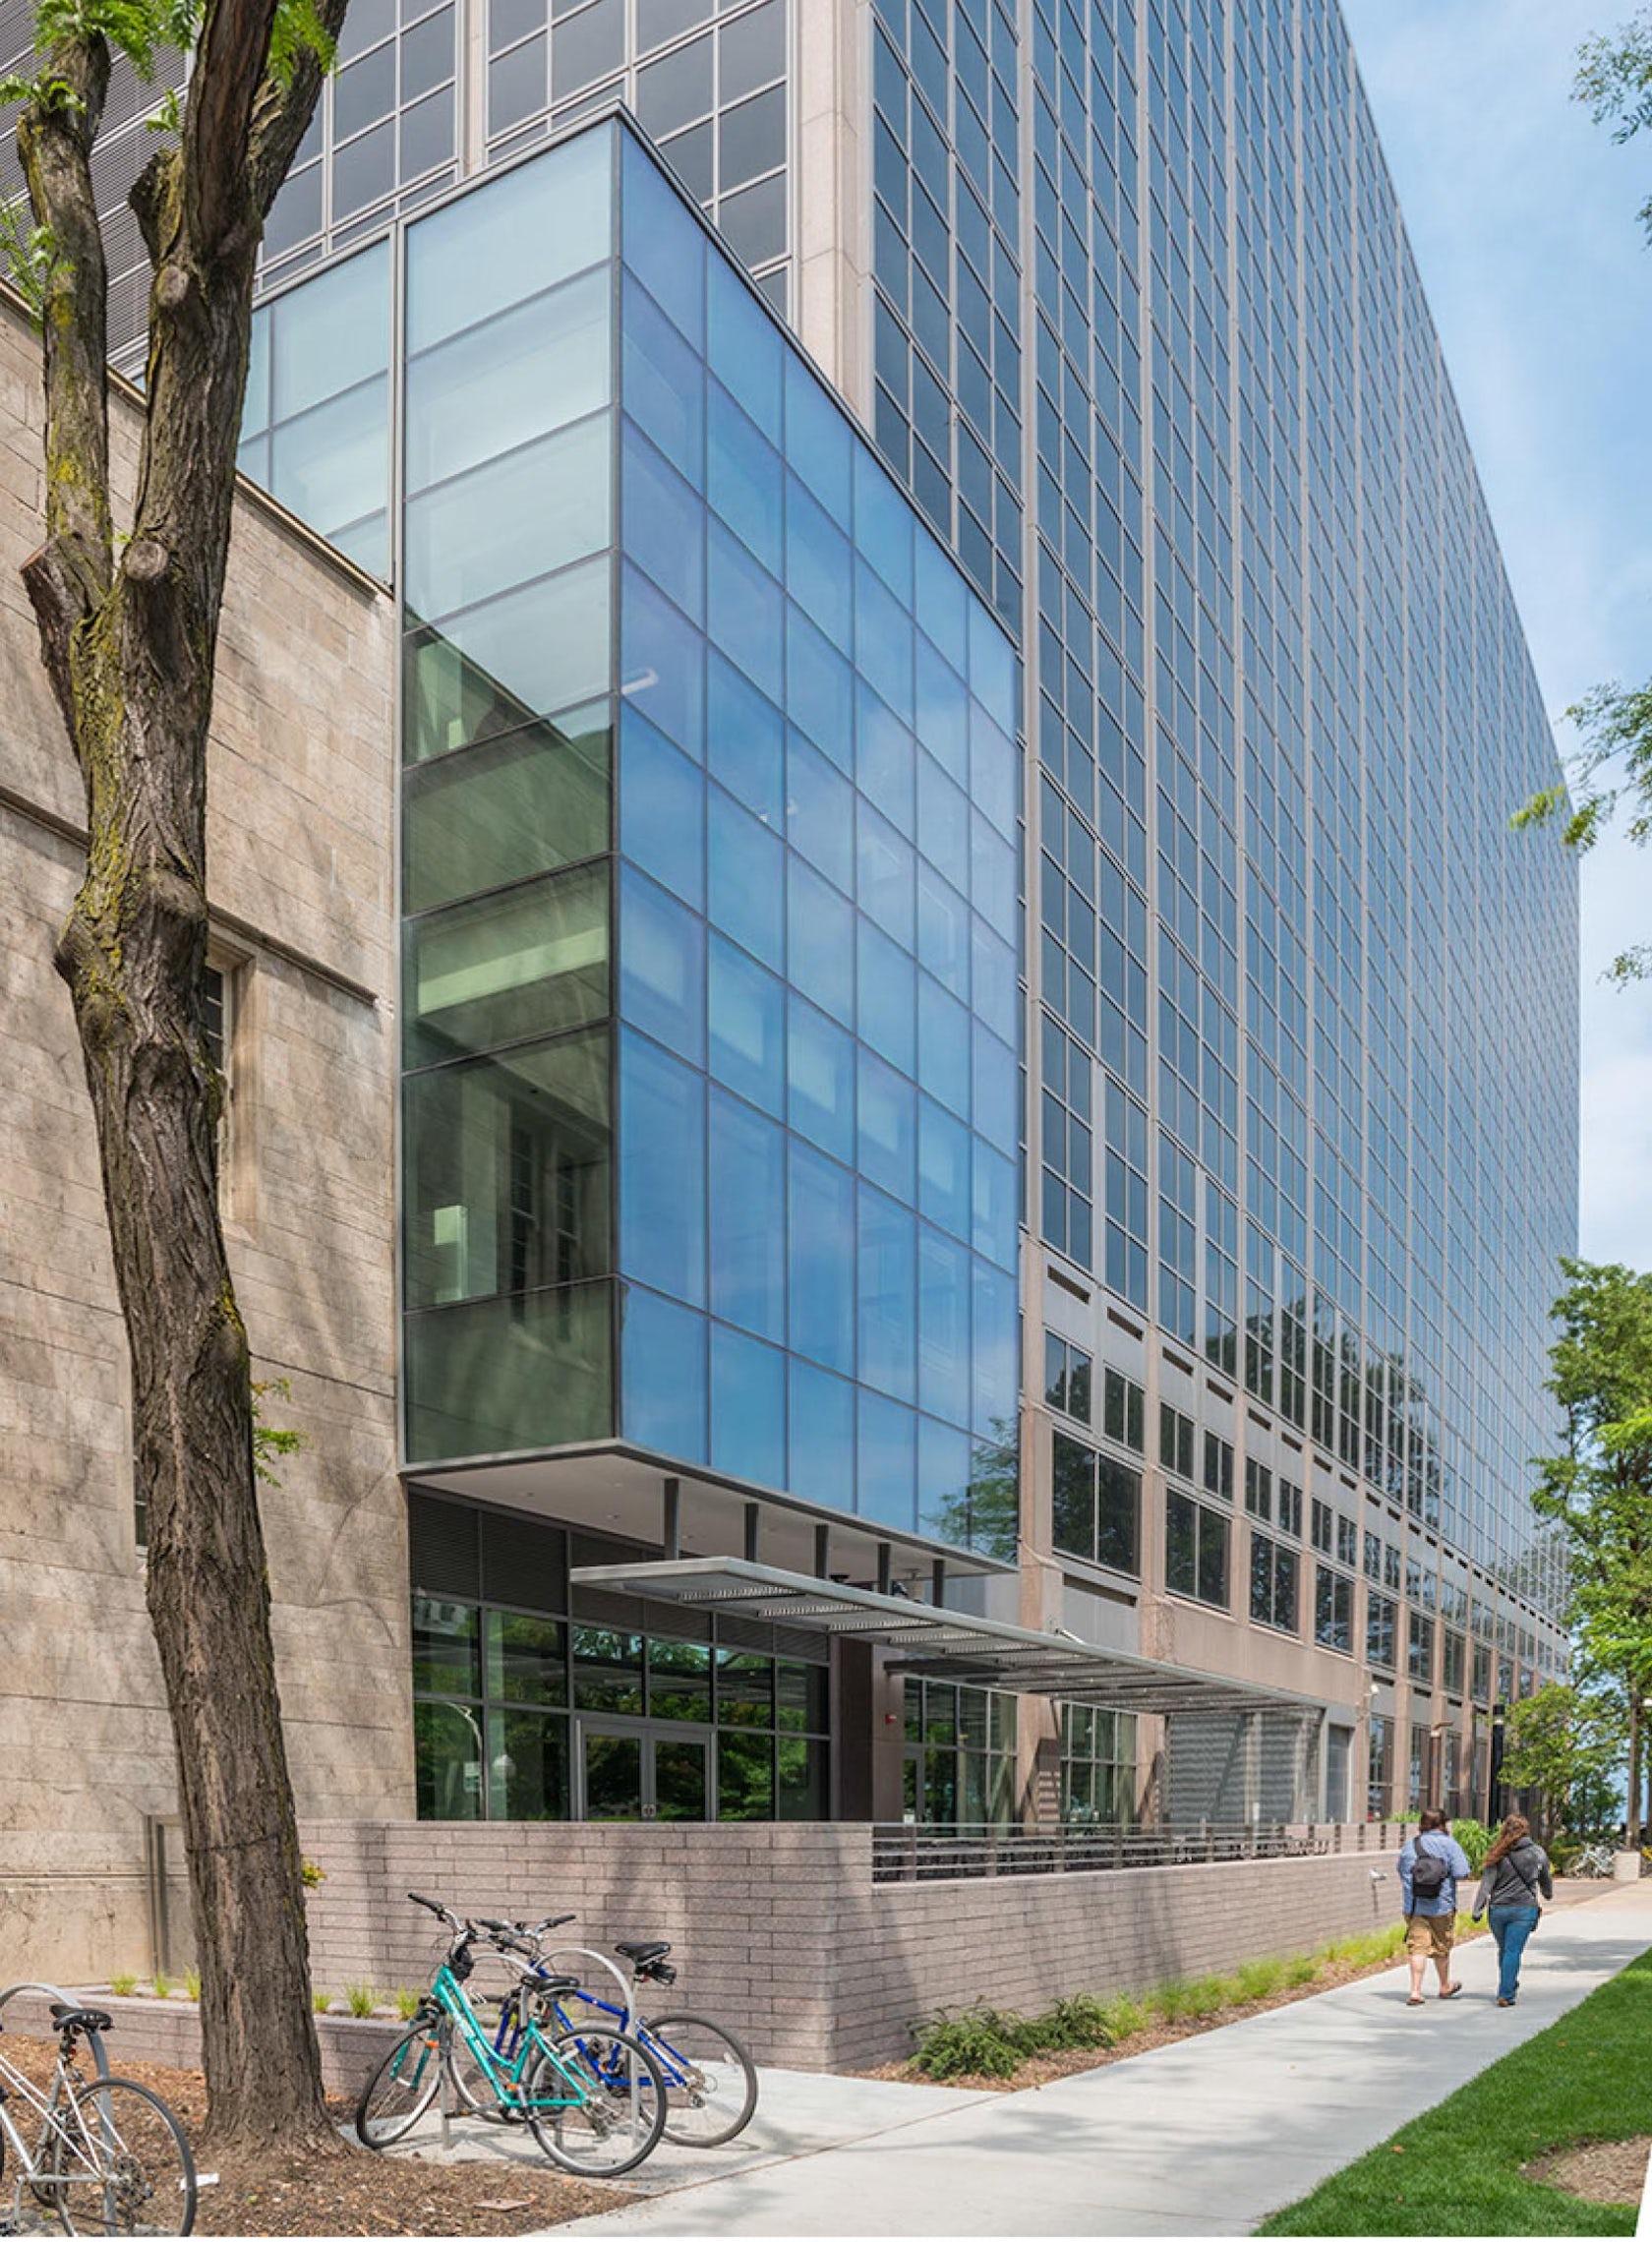 North Knox Auto >> Northwestern University School of Law Rubloff Building Atrium Addition - Architizer